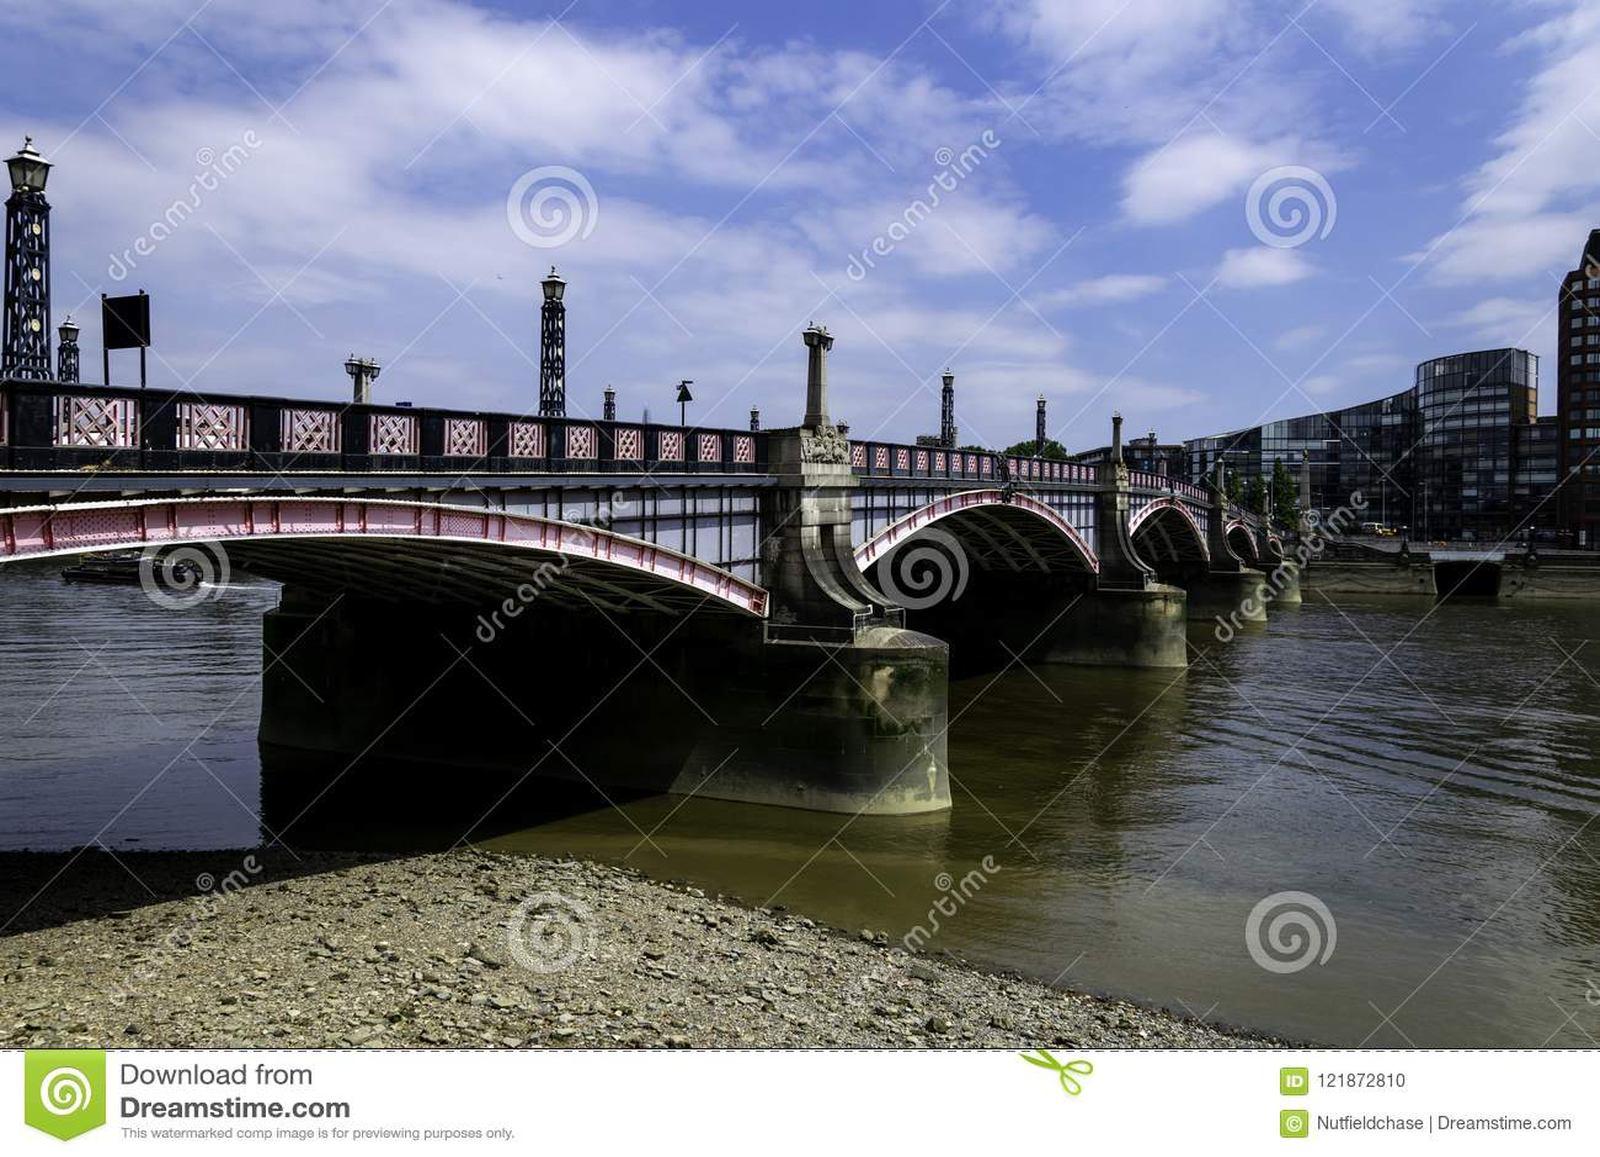 Lambeth Bridge over the River Thames